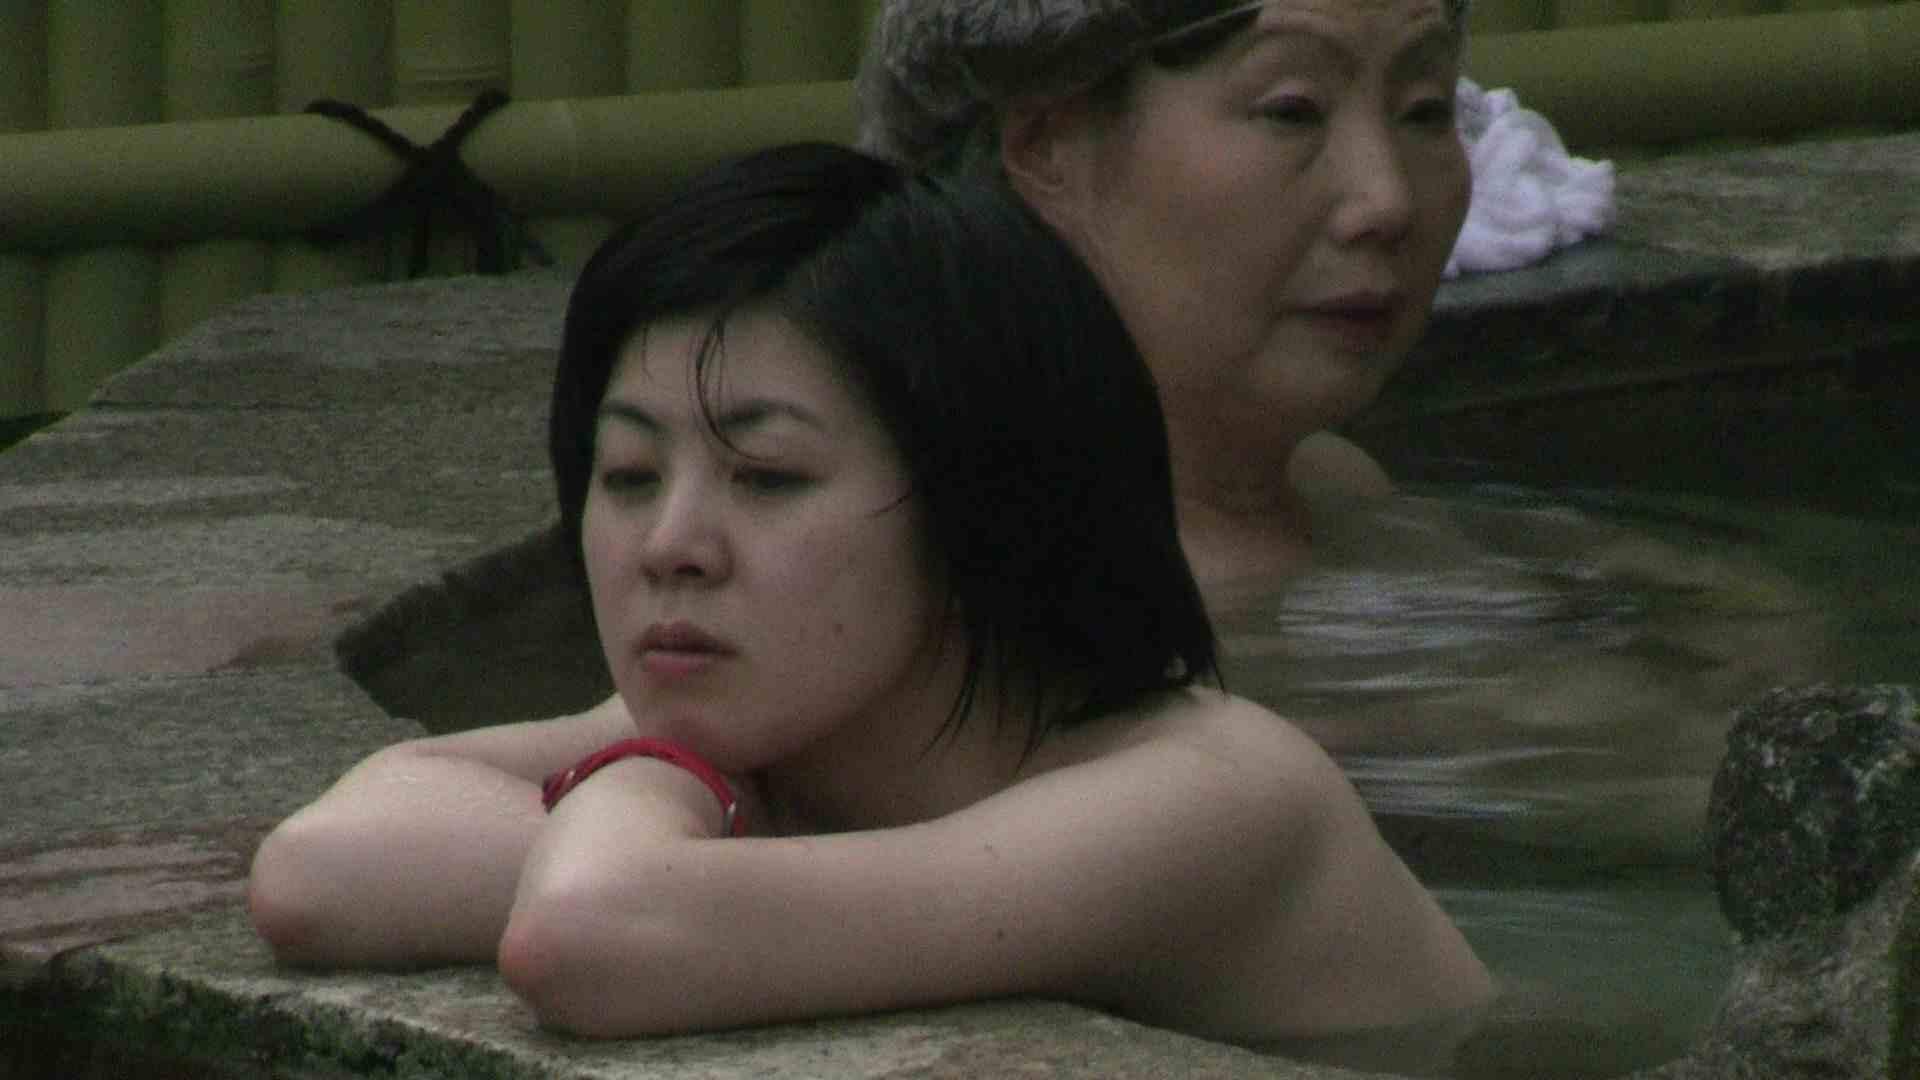 Aquaな露天風呂Vol.685 露天 オメコ無修正動画無料 13pic 5